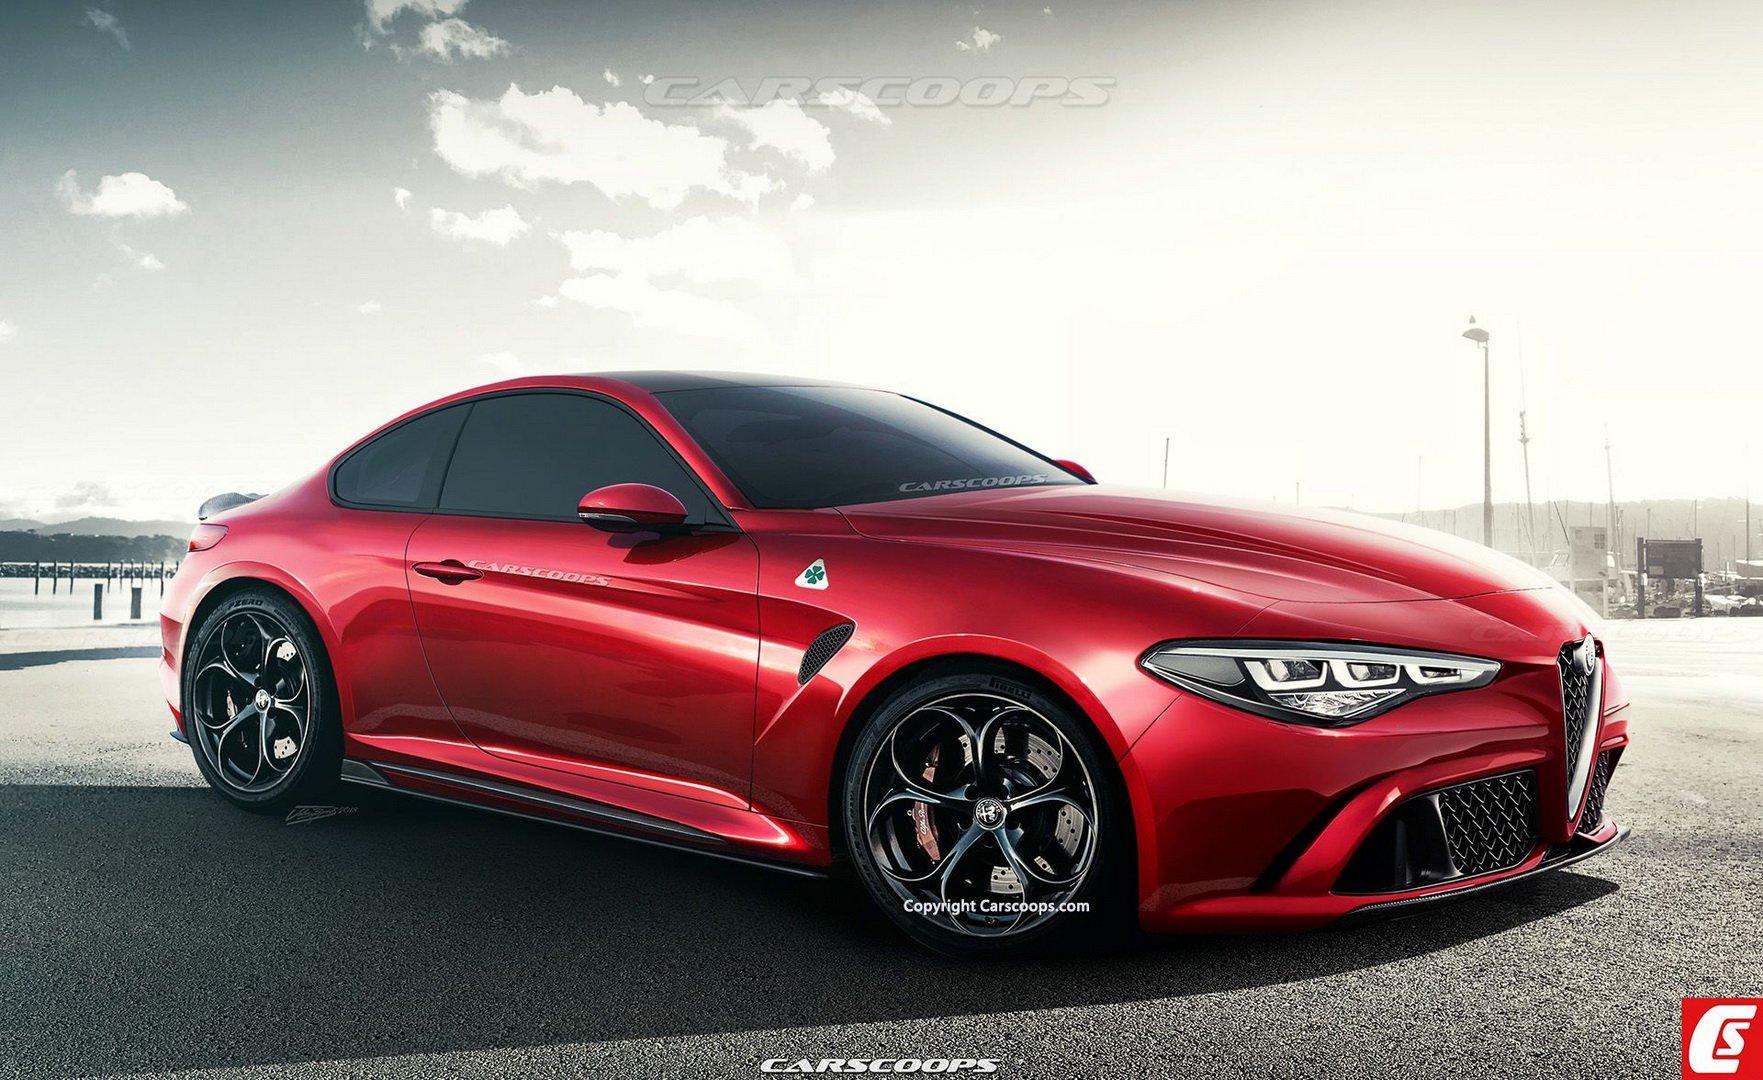 Гибридный суперкар Alfa Romeo GTV появится в 2021 году